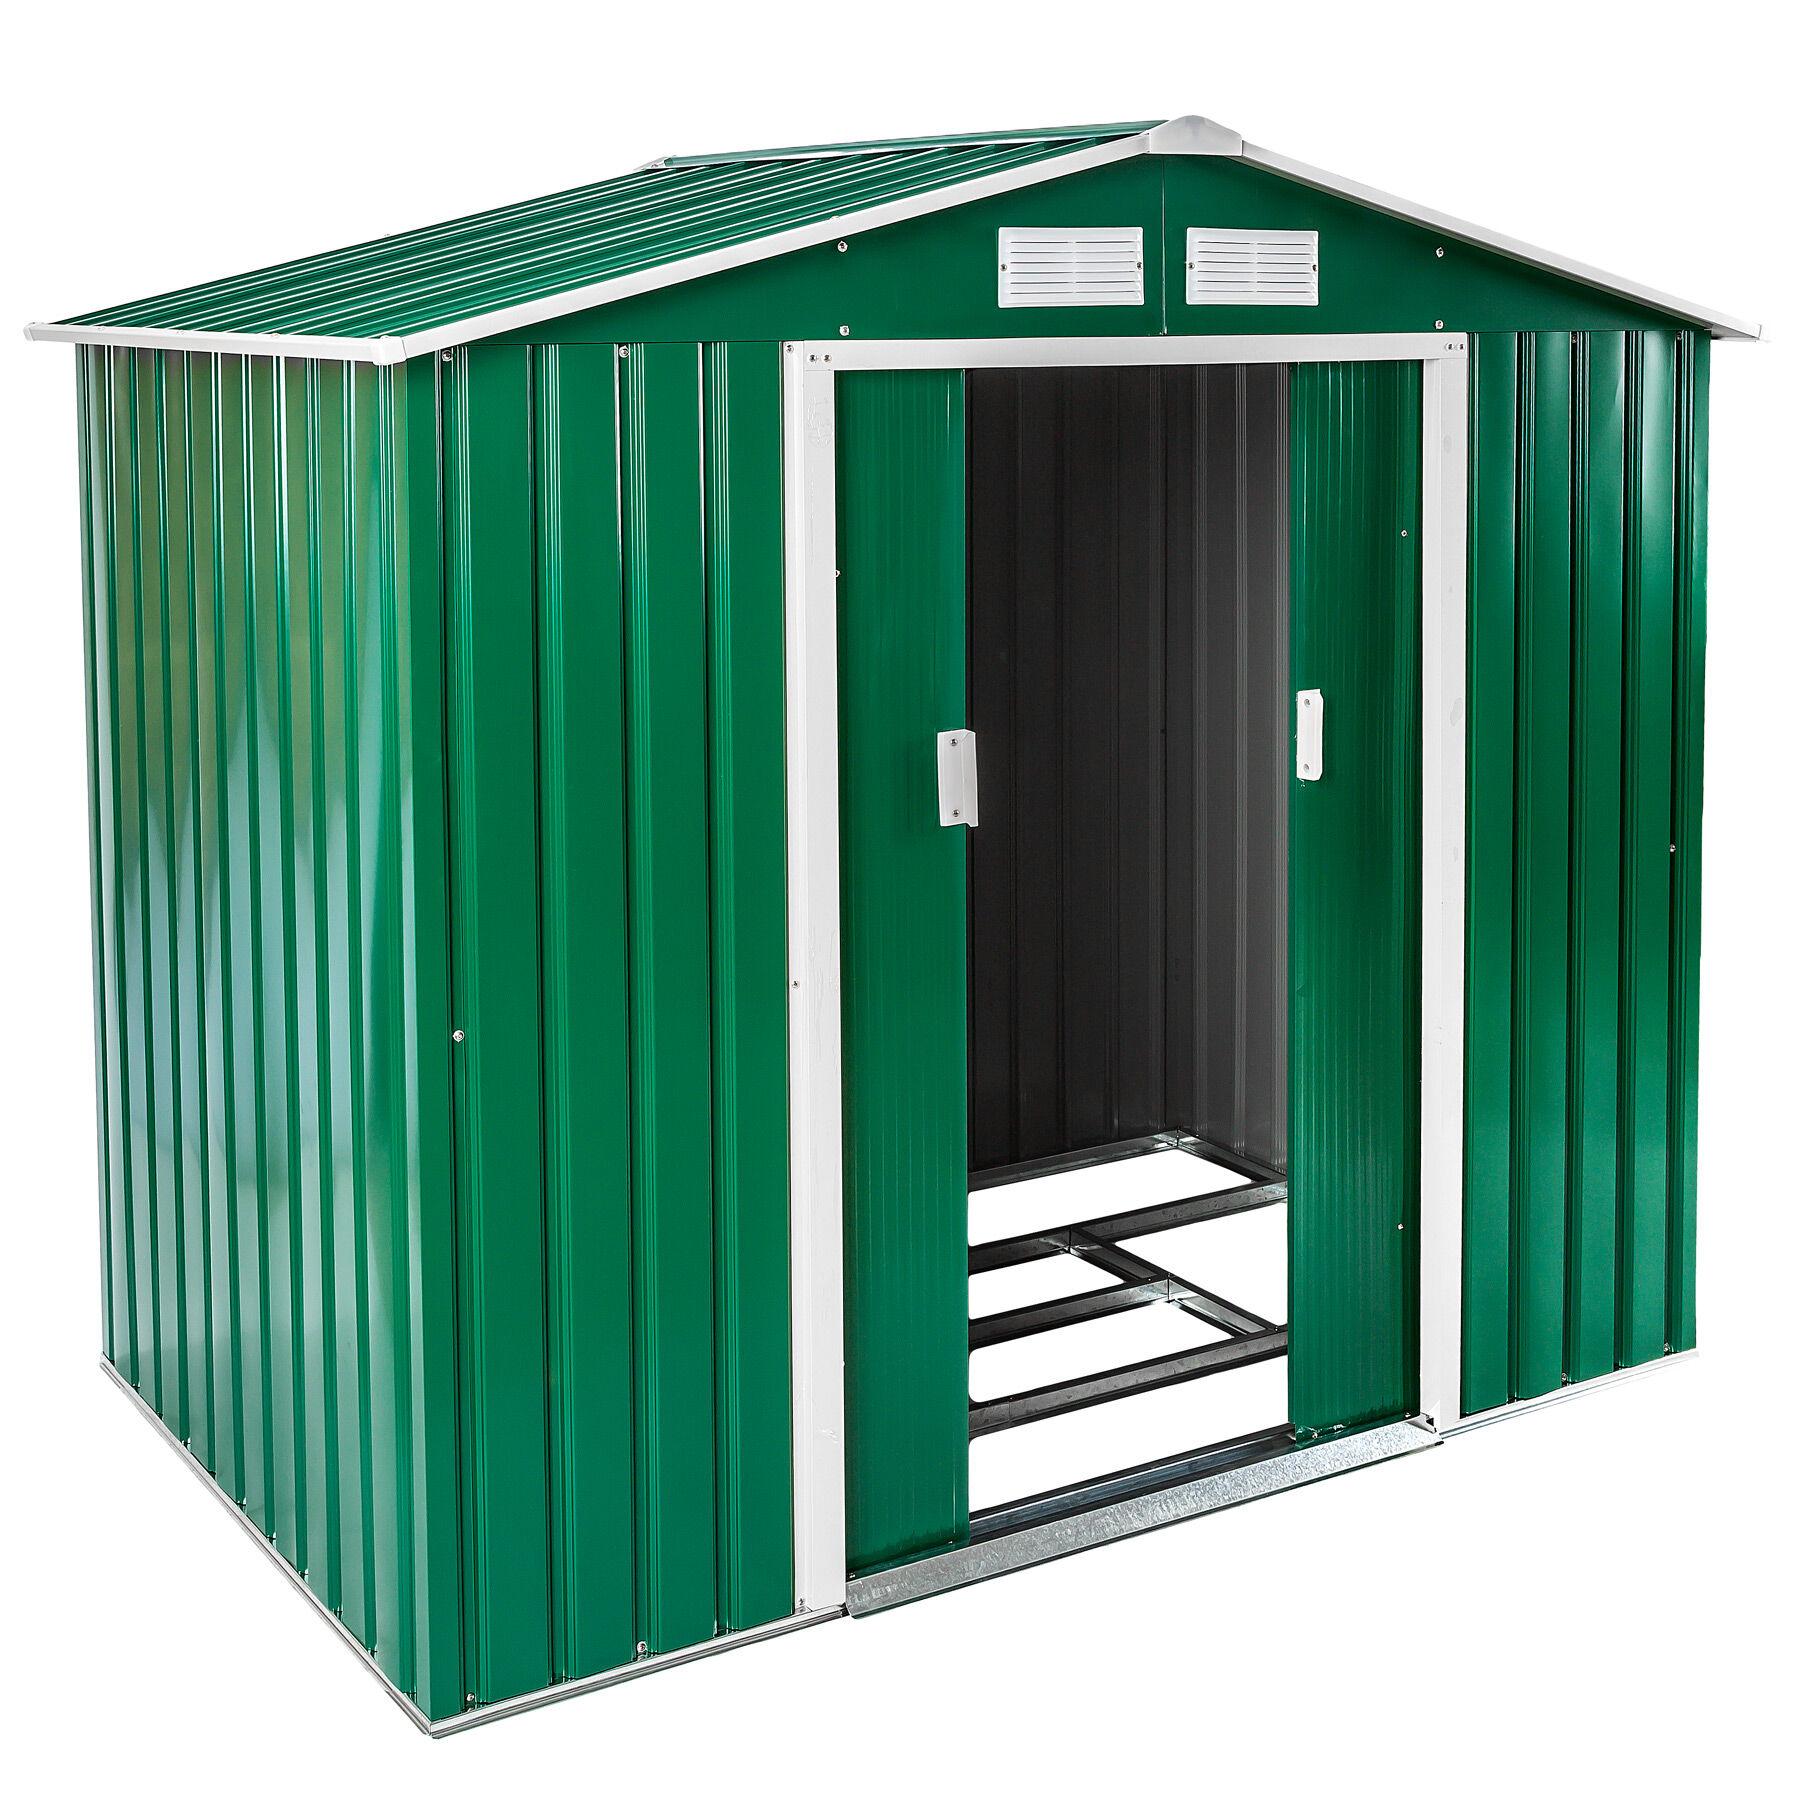 tectake casetta da giardino con tetto a doppia falda - verde